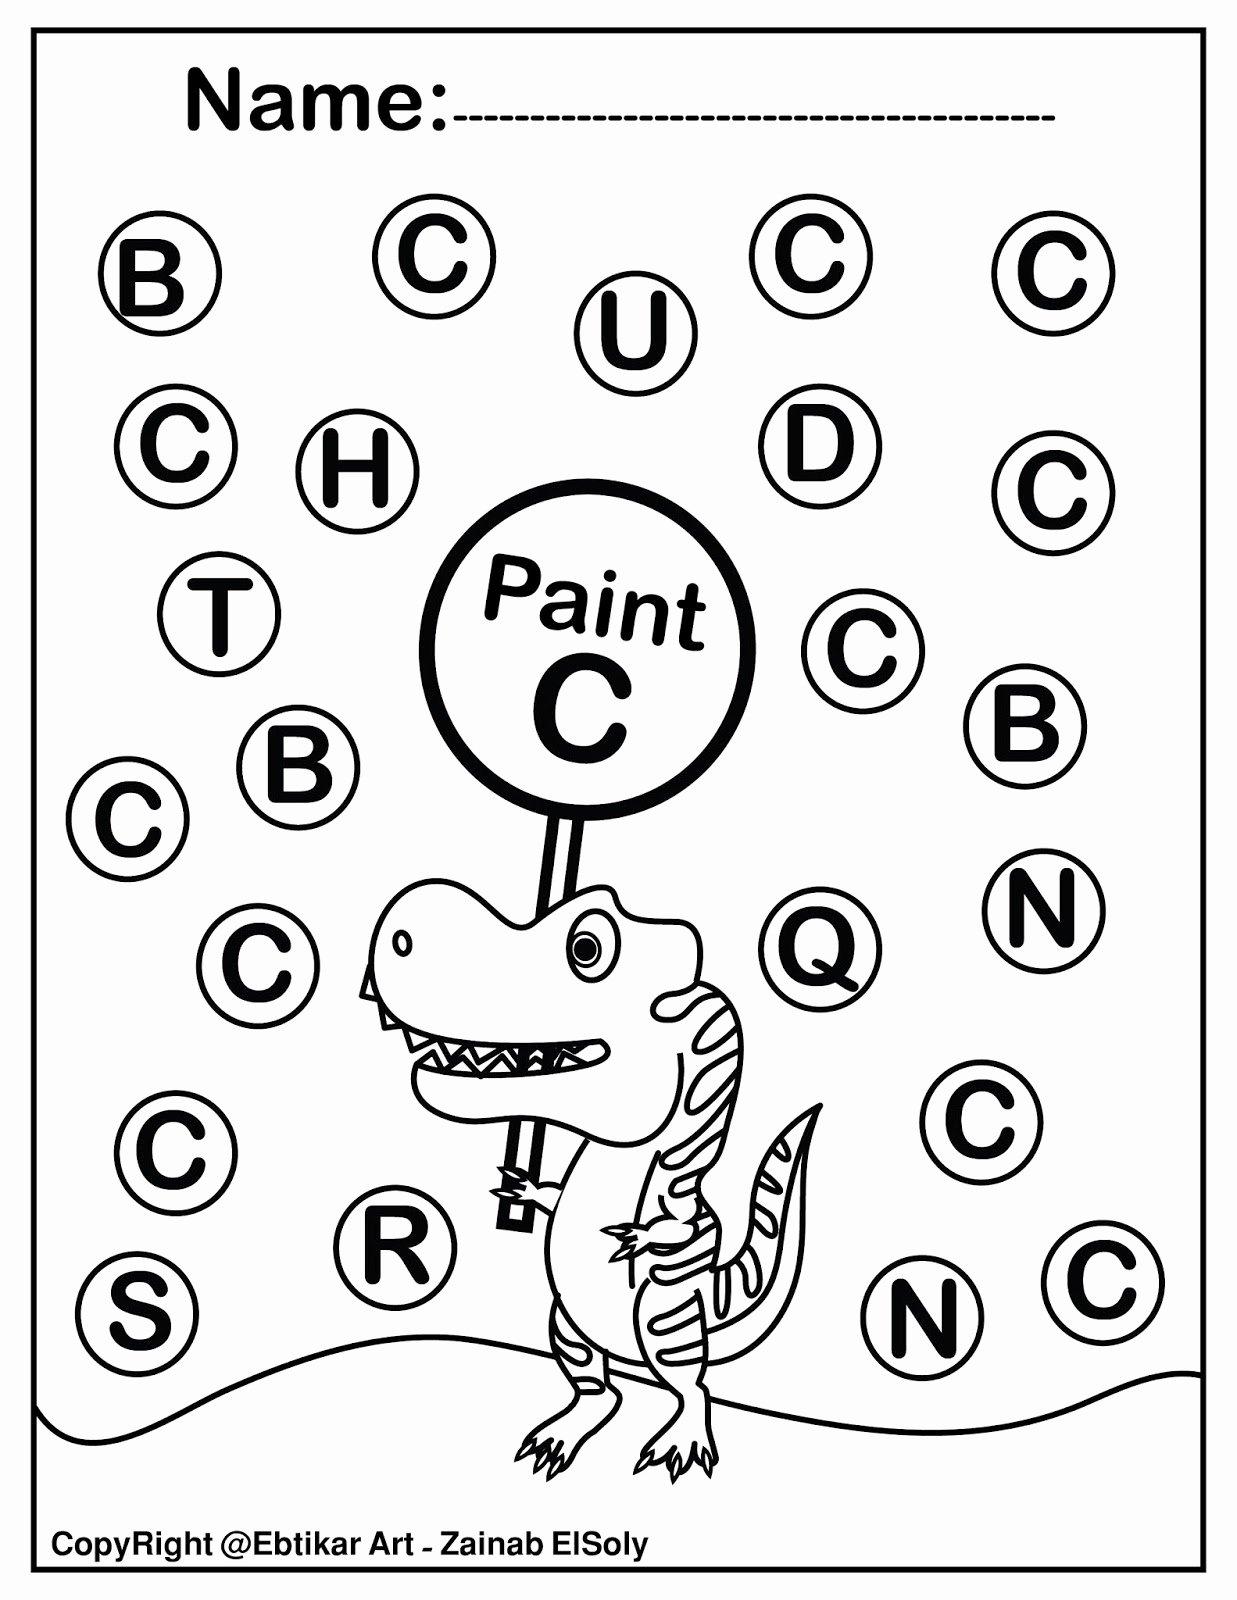 Painting Worksheets for Preschoolers Inspirational Worksheets Set Dinosaur Trex Activity Paint Dot